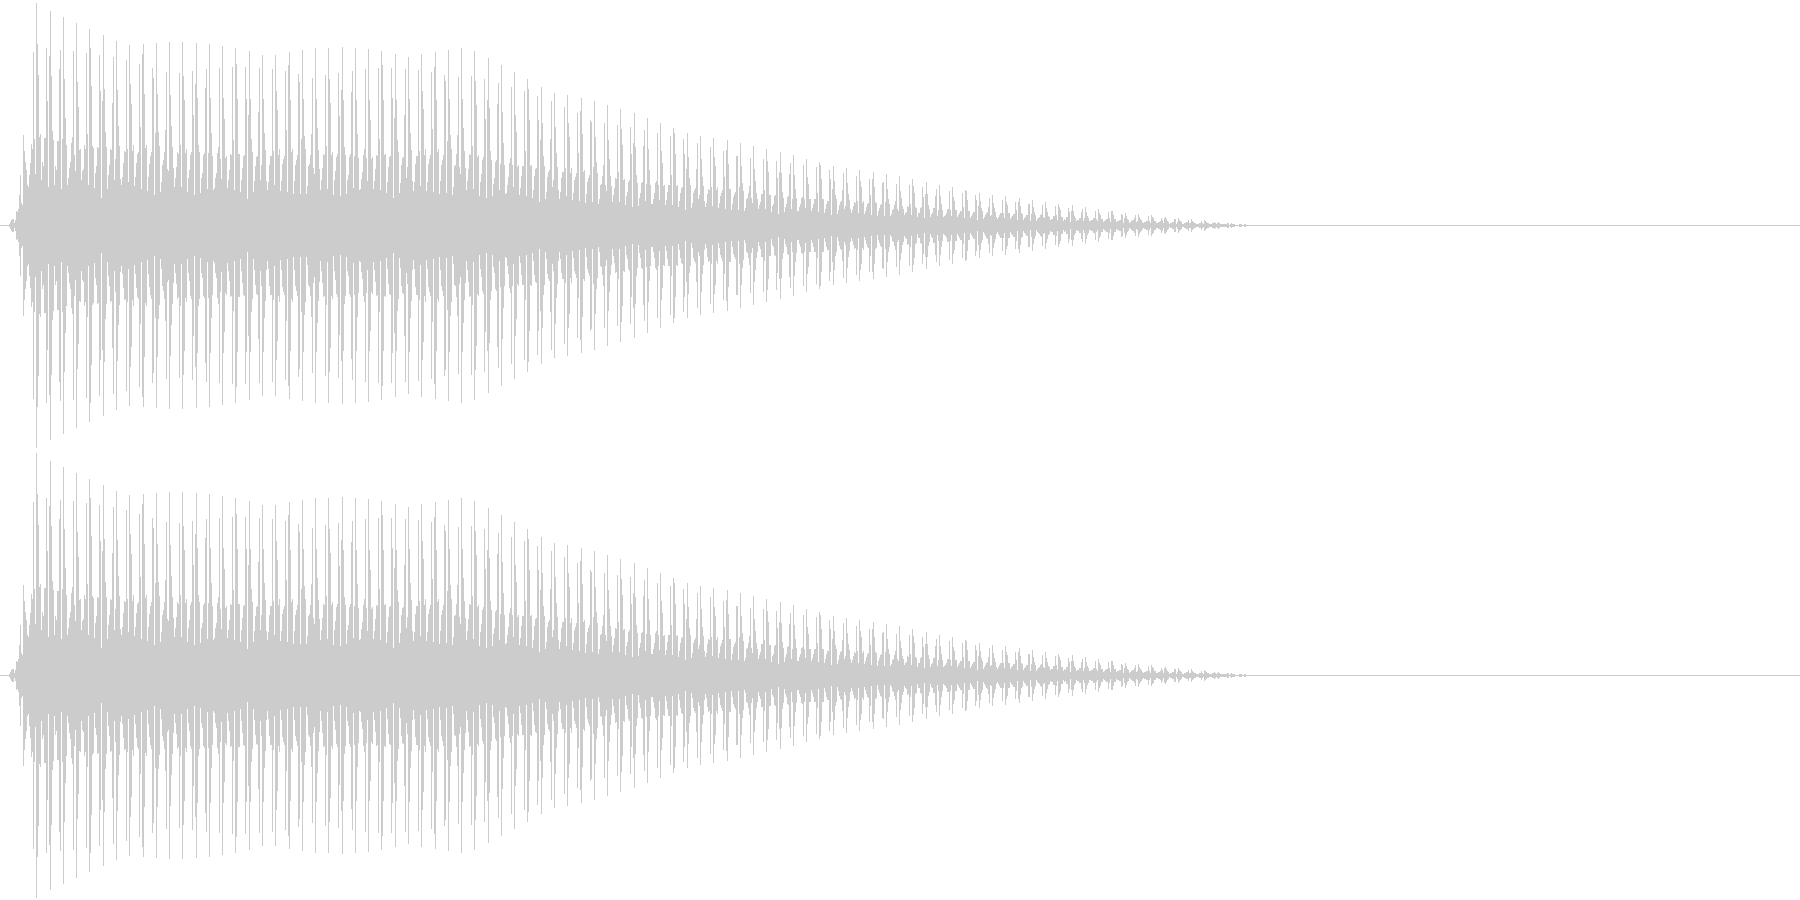 OctaveCom アプリ用タッチ音9の未再生の波形